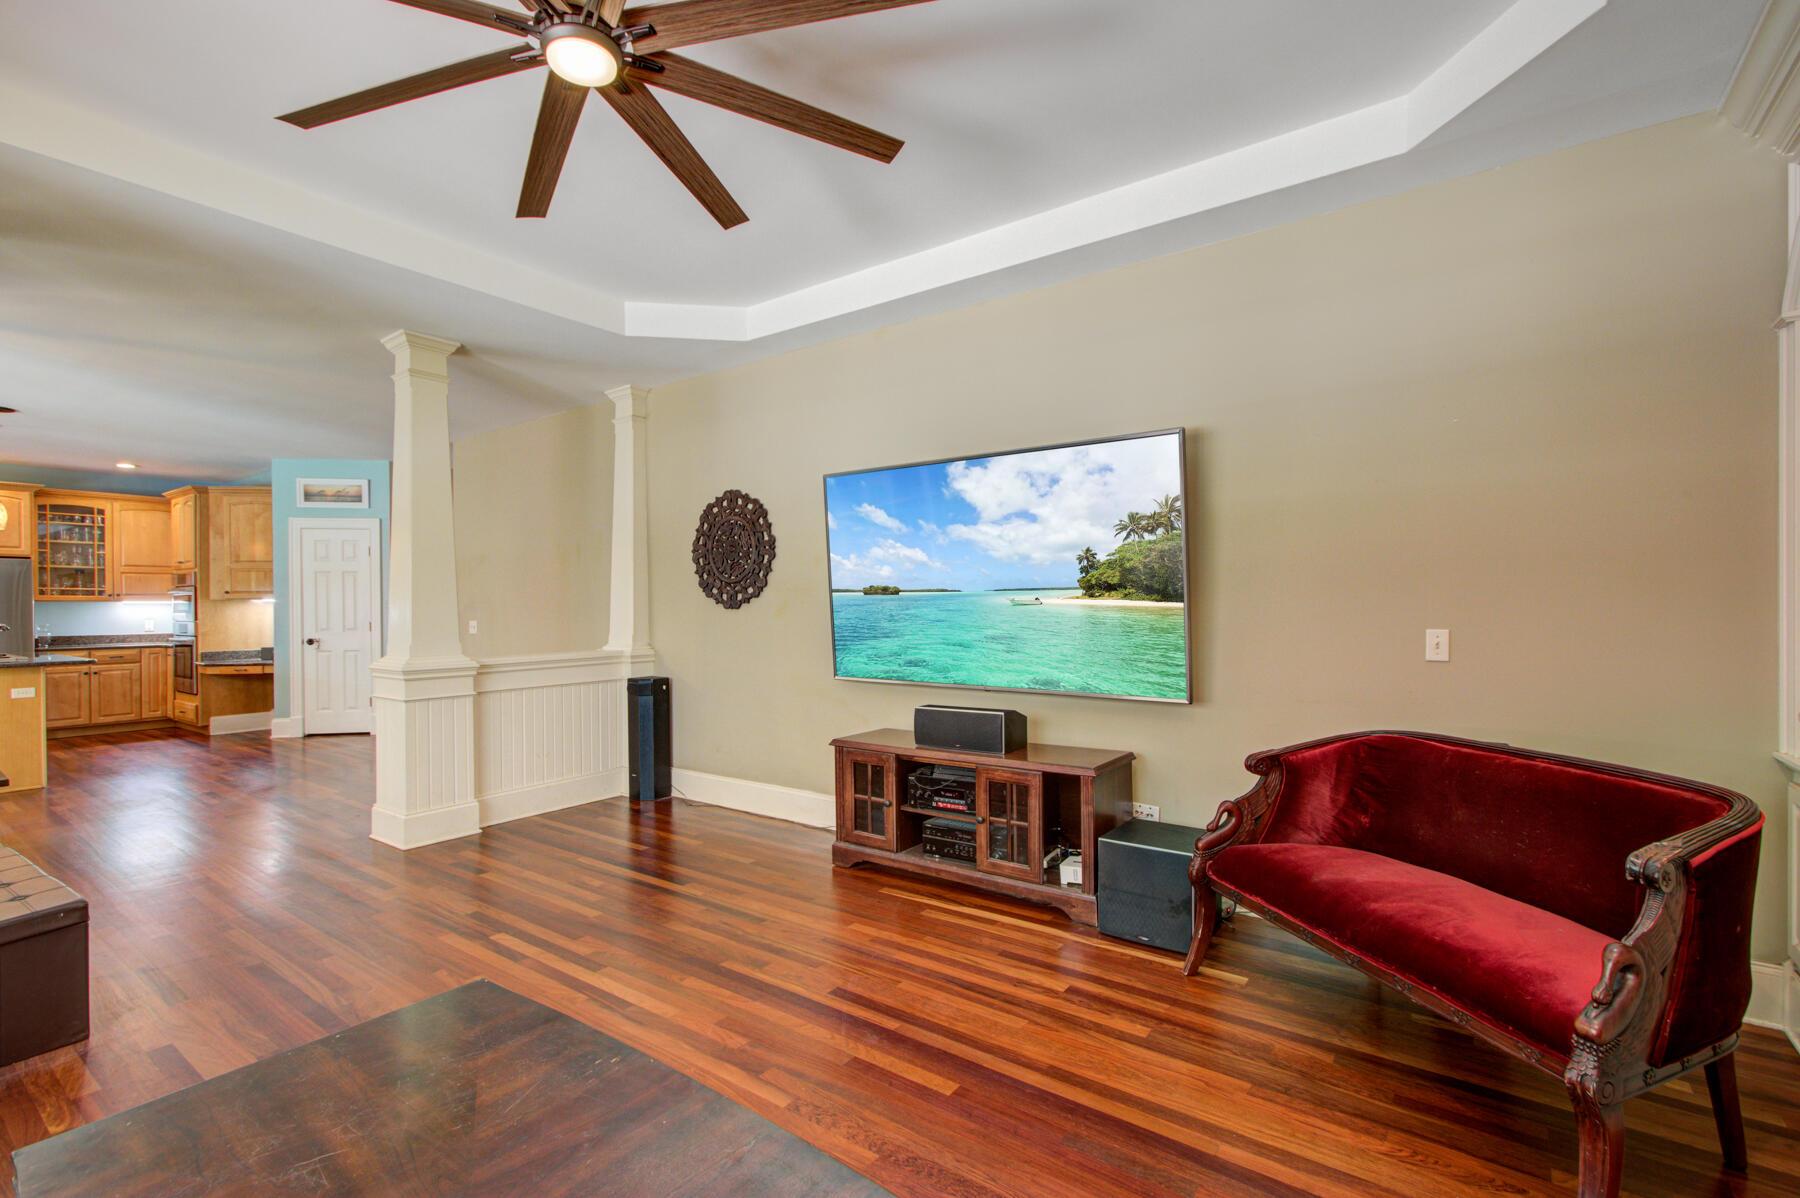 Dunes West Homes For Sale - 3095 Pignatelli, Mount Pleasant, SC - 13